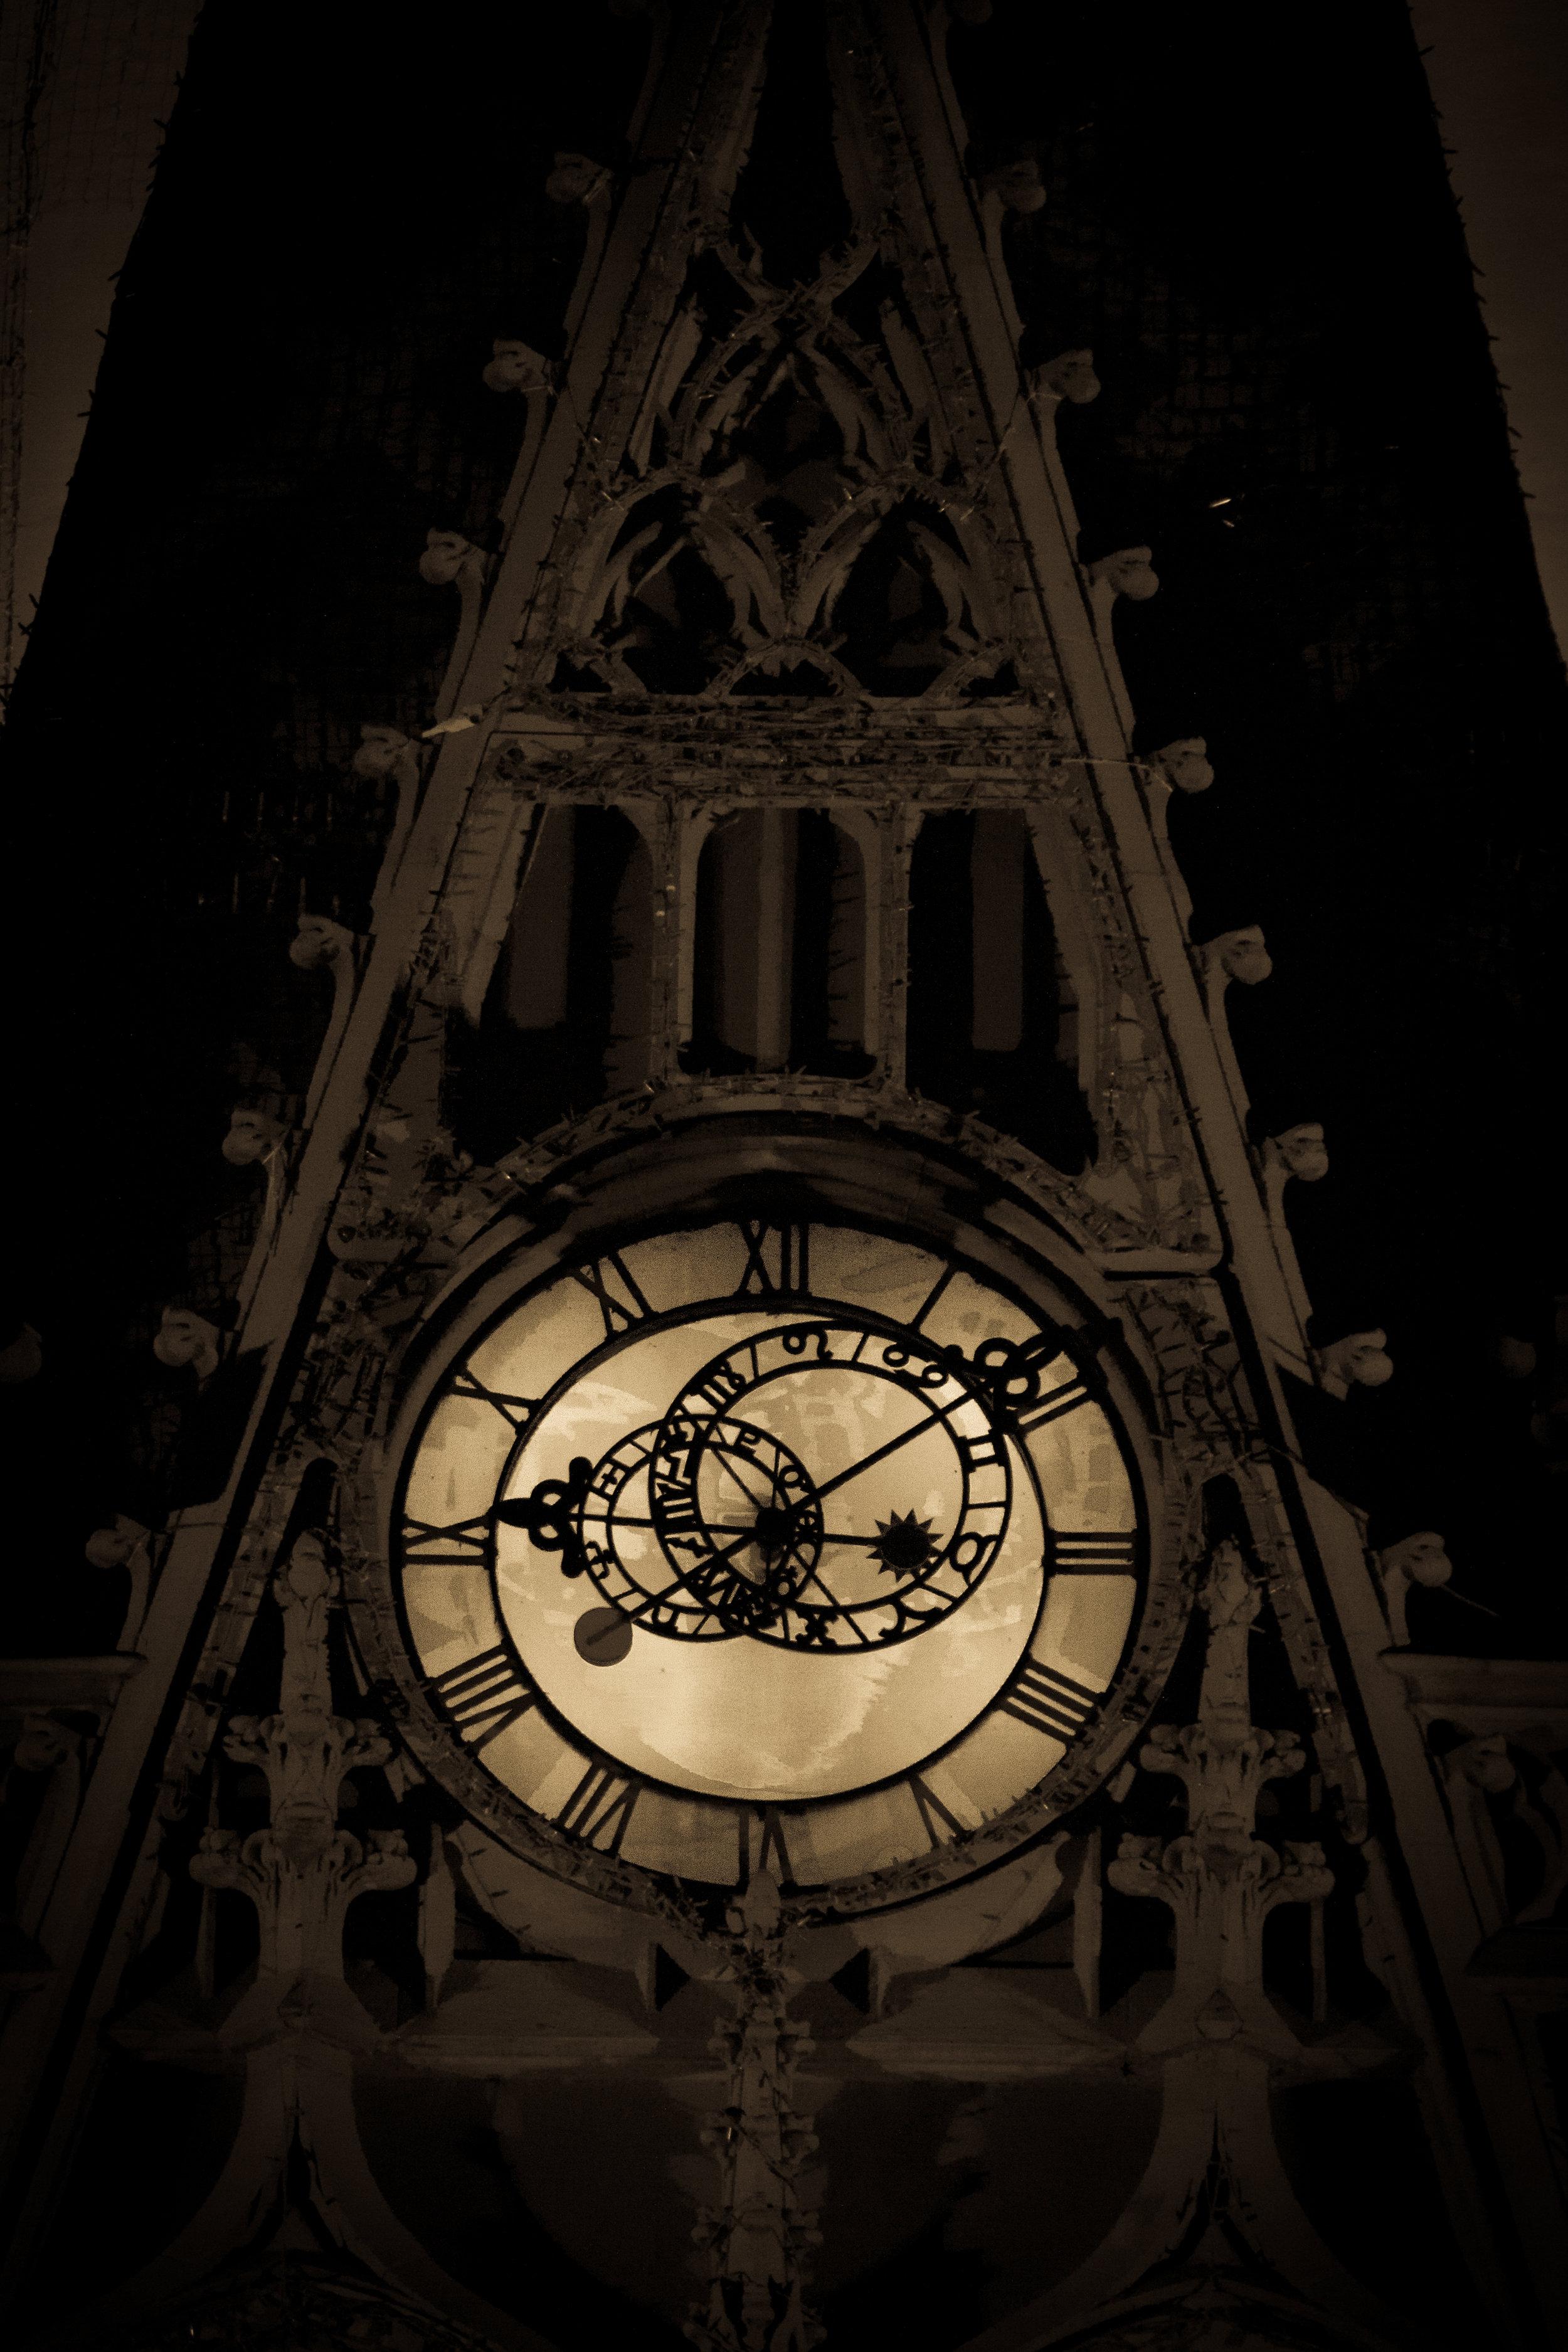 The clocktower at Cinderella's Castle